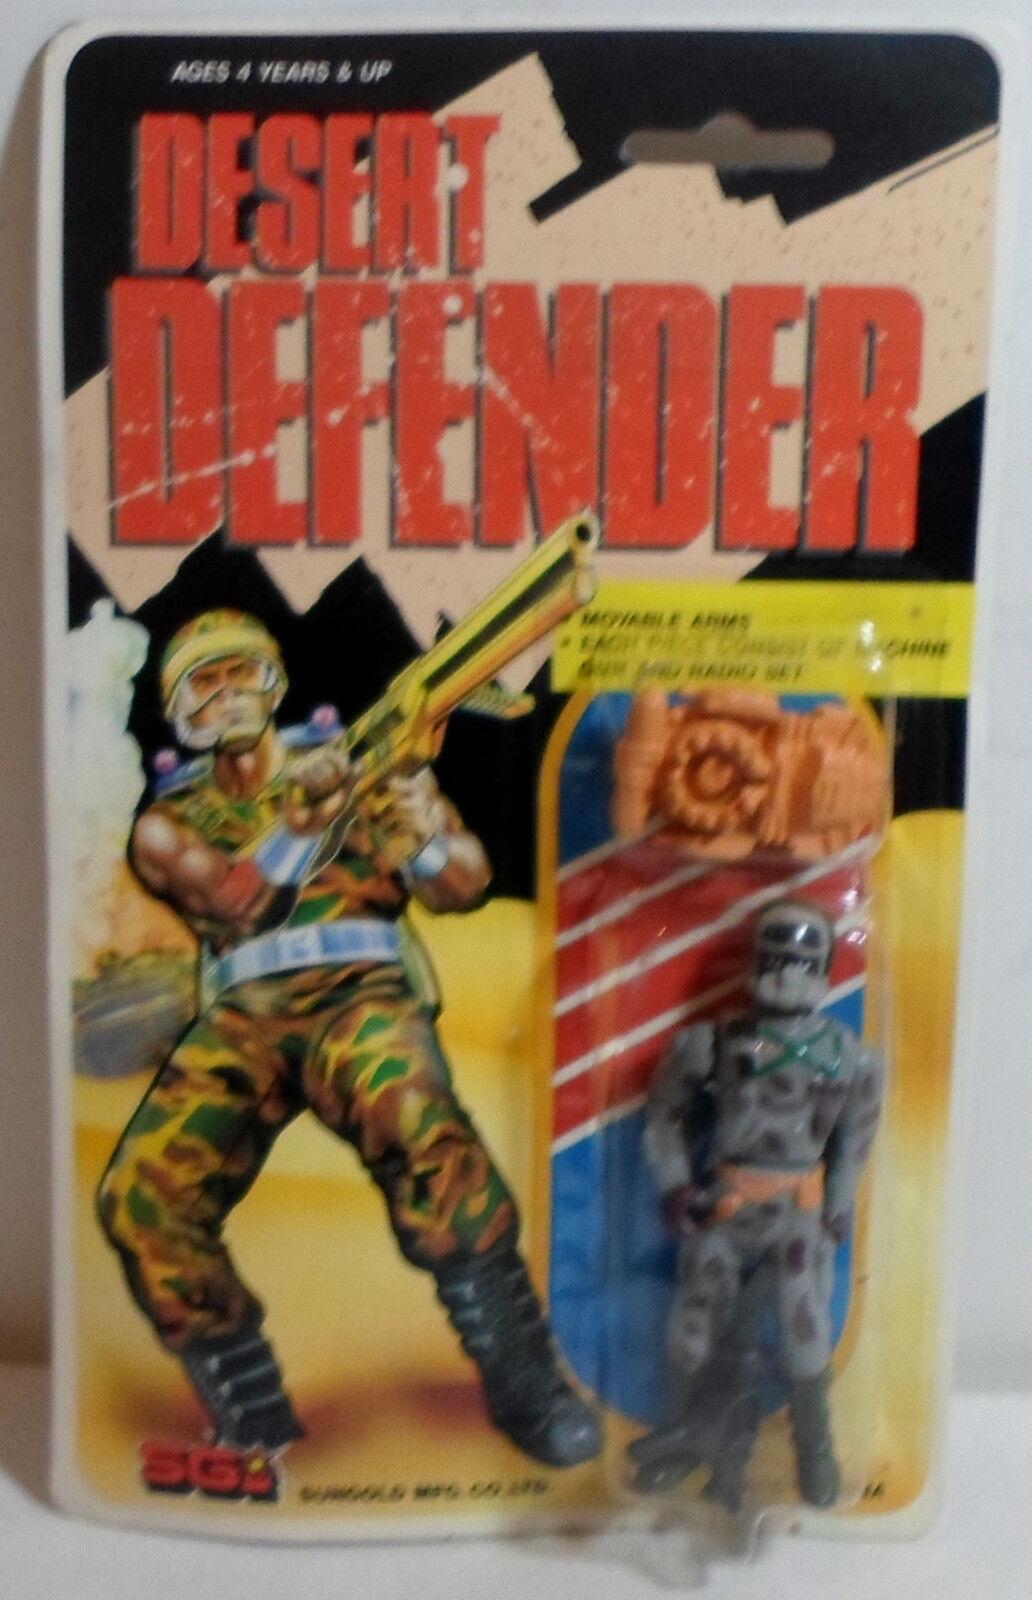 SGI SUNgold VTG 80's GI JOE DESERT DEFENDER ACTION FIGURE MOSC SEALED D